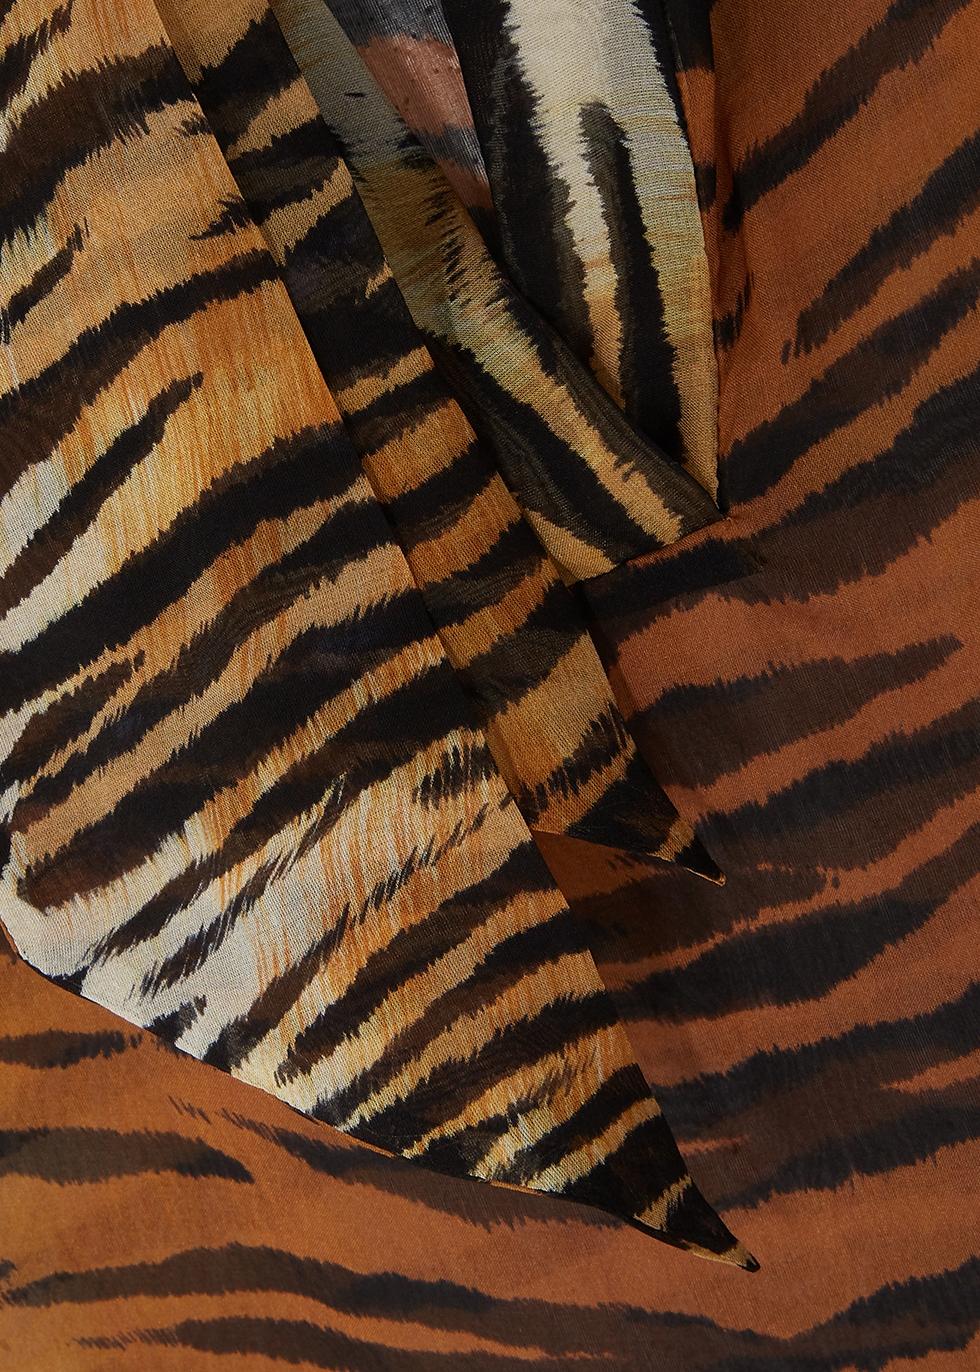 Tiger-print silk-chiffon blouse - Alexandre Vauthier